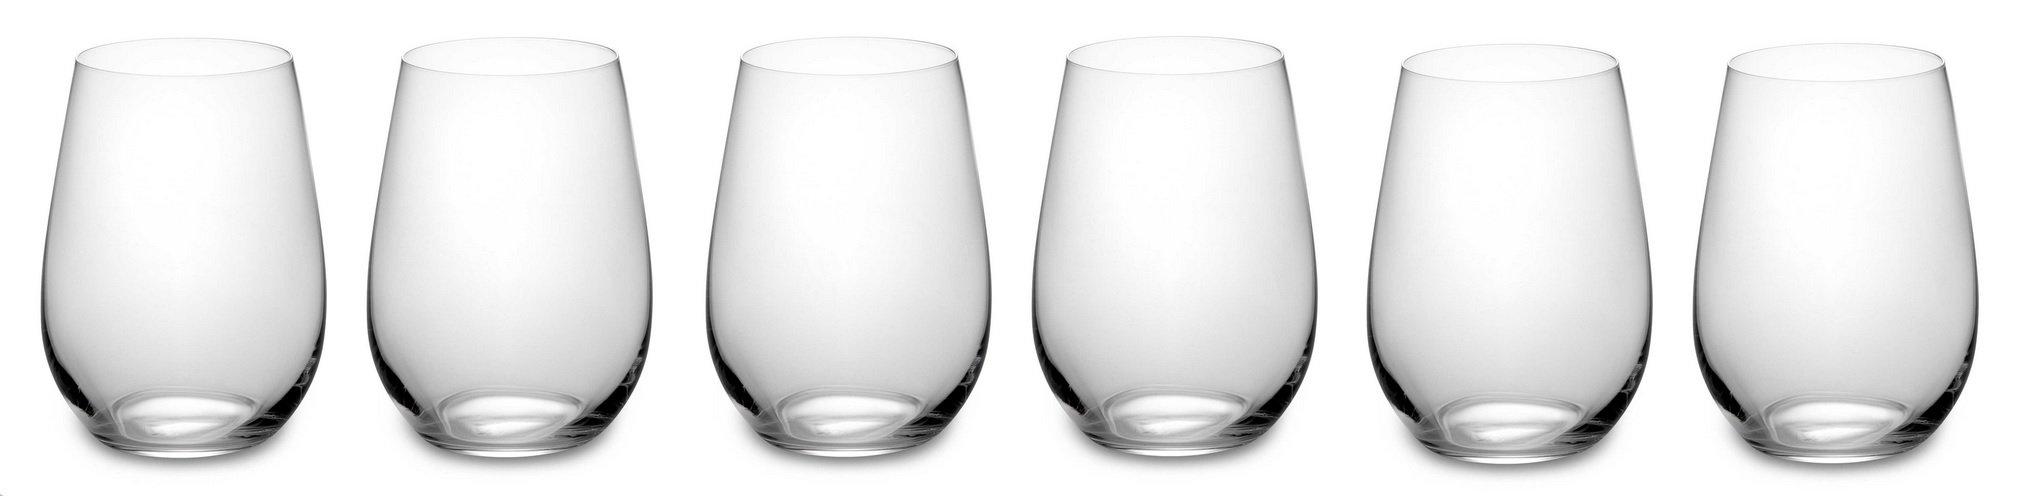 Riedel 260 Years Celebration, O Riesling/Zinfandel Glasses, Set of 6